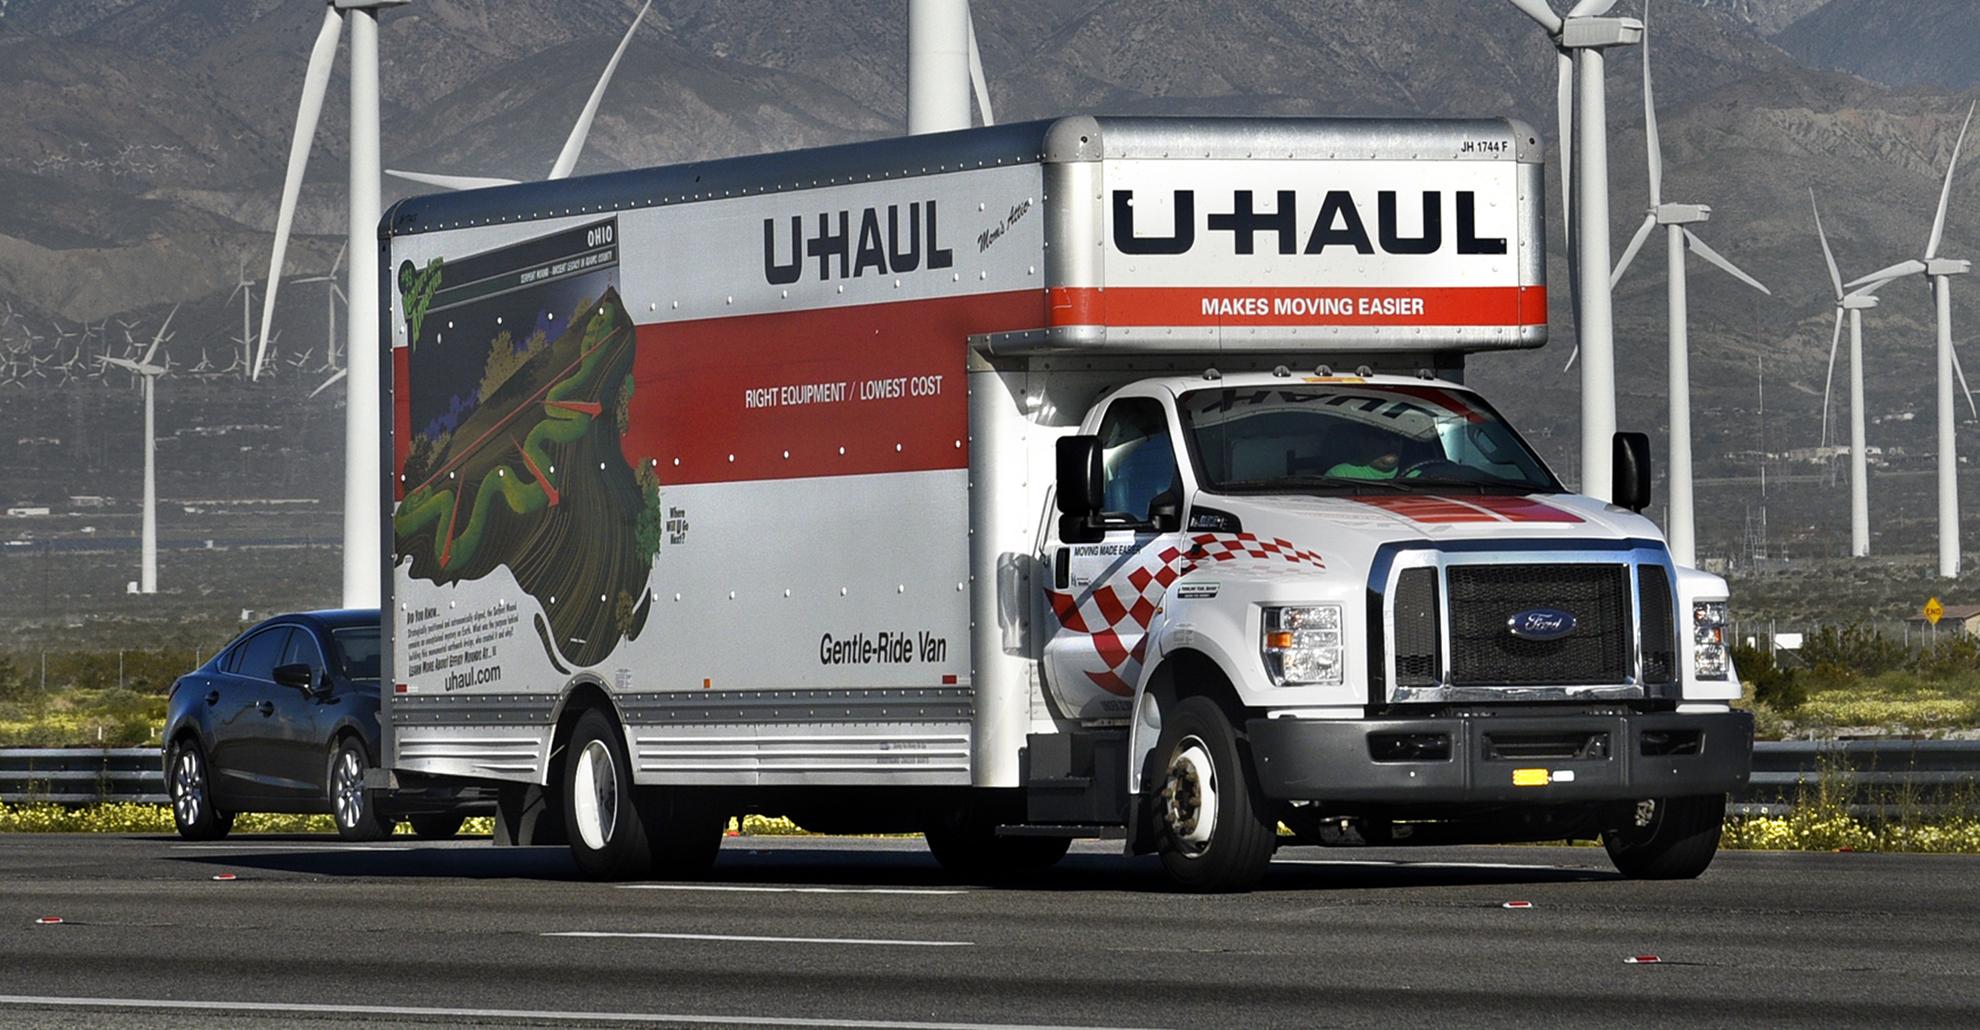 Uhaul Truck 4